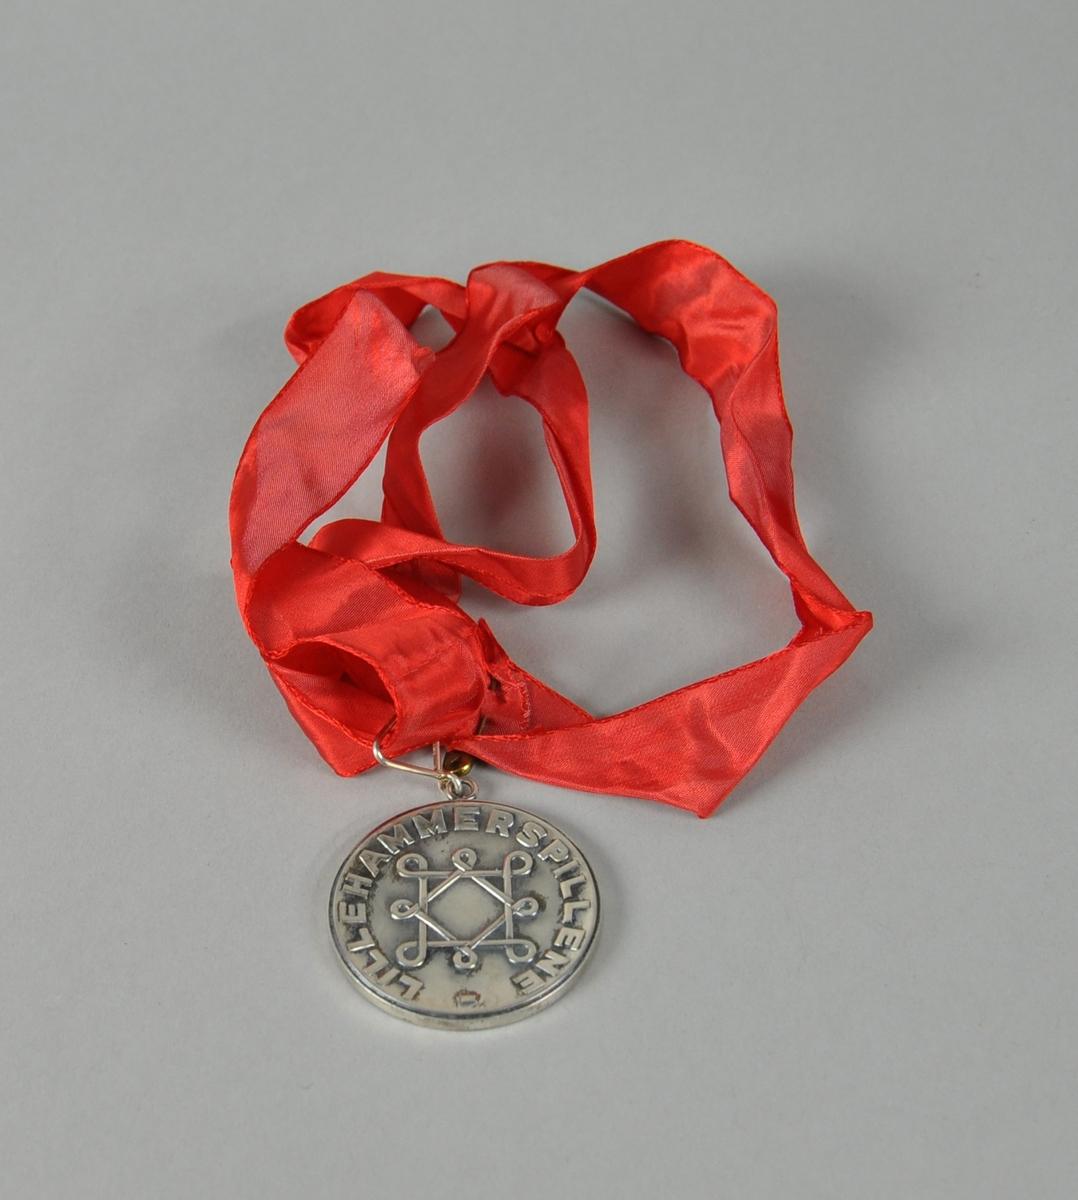 Rund bronsemedalje med rødt bånd, med symbol i sentrum og tekst rundt kanten.